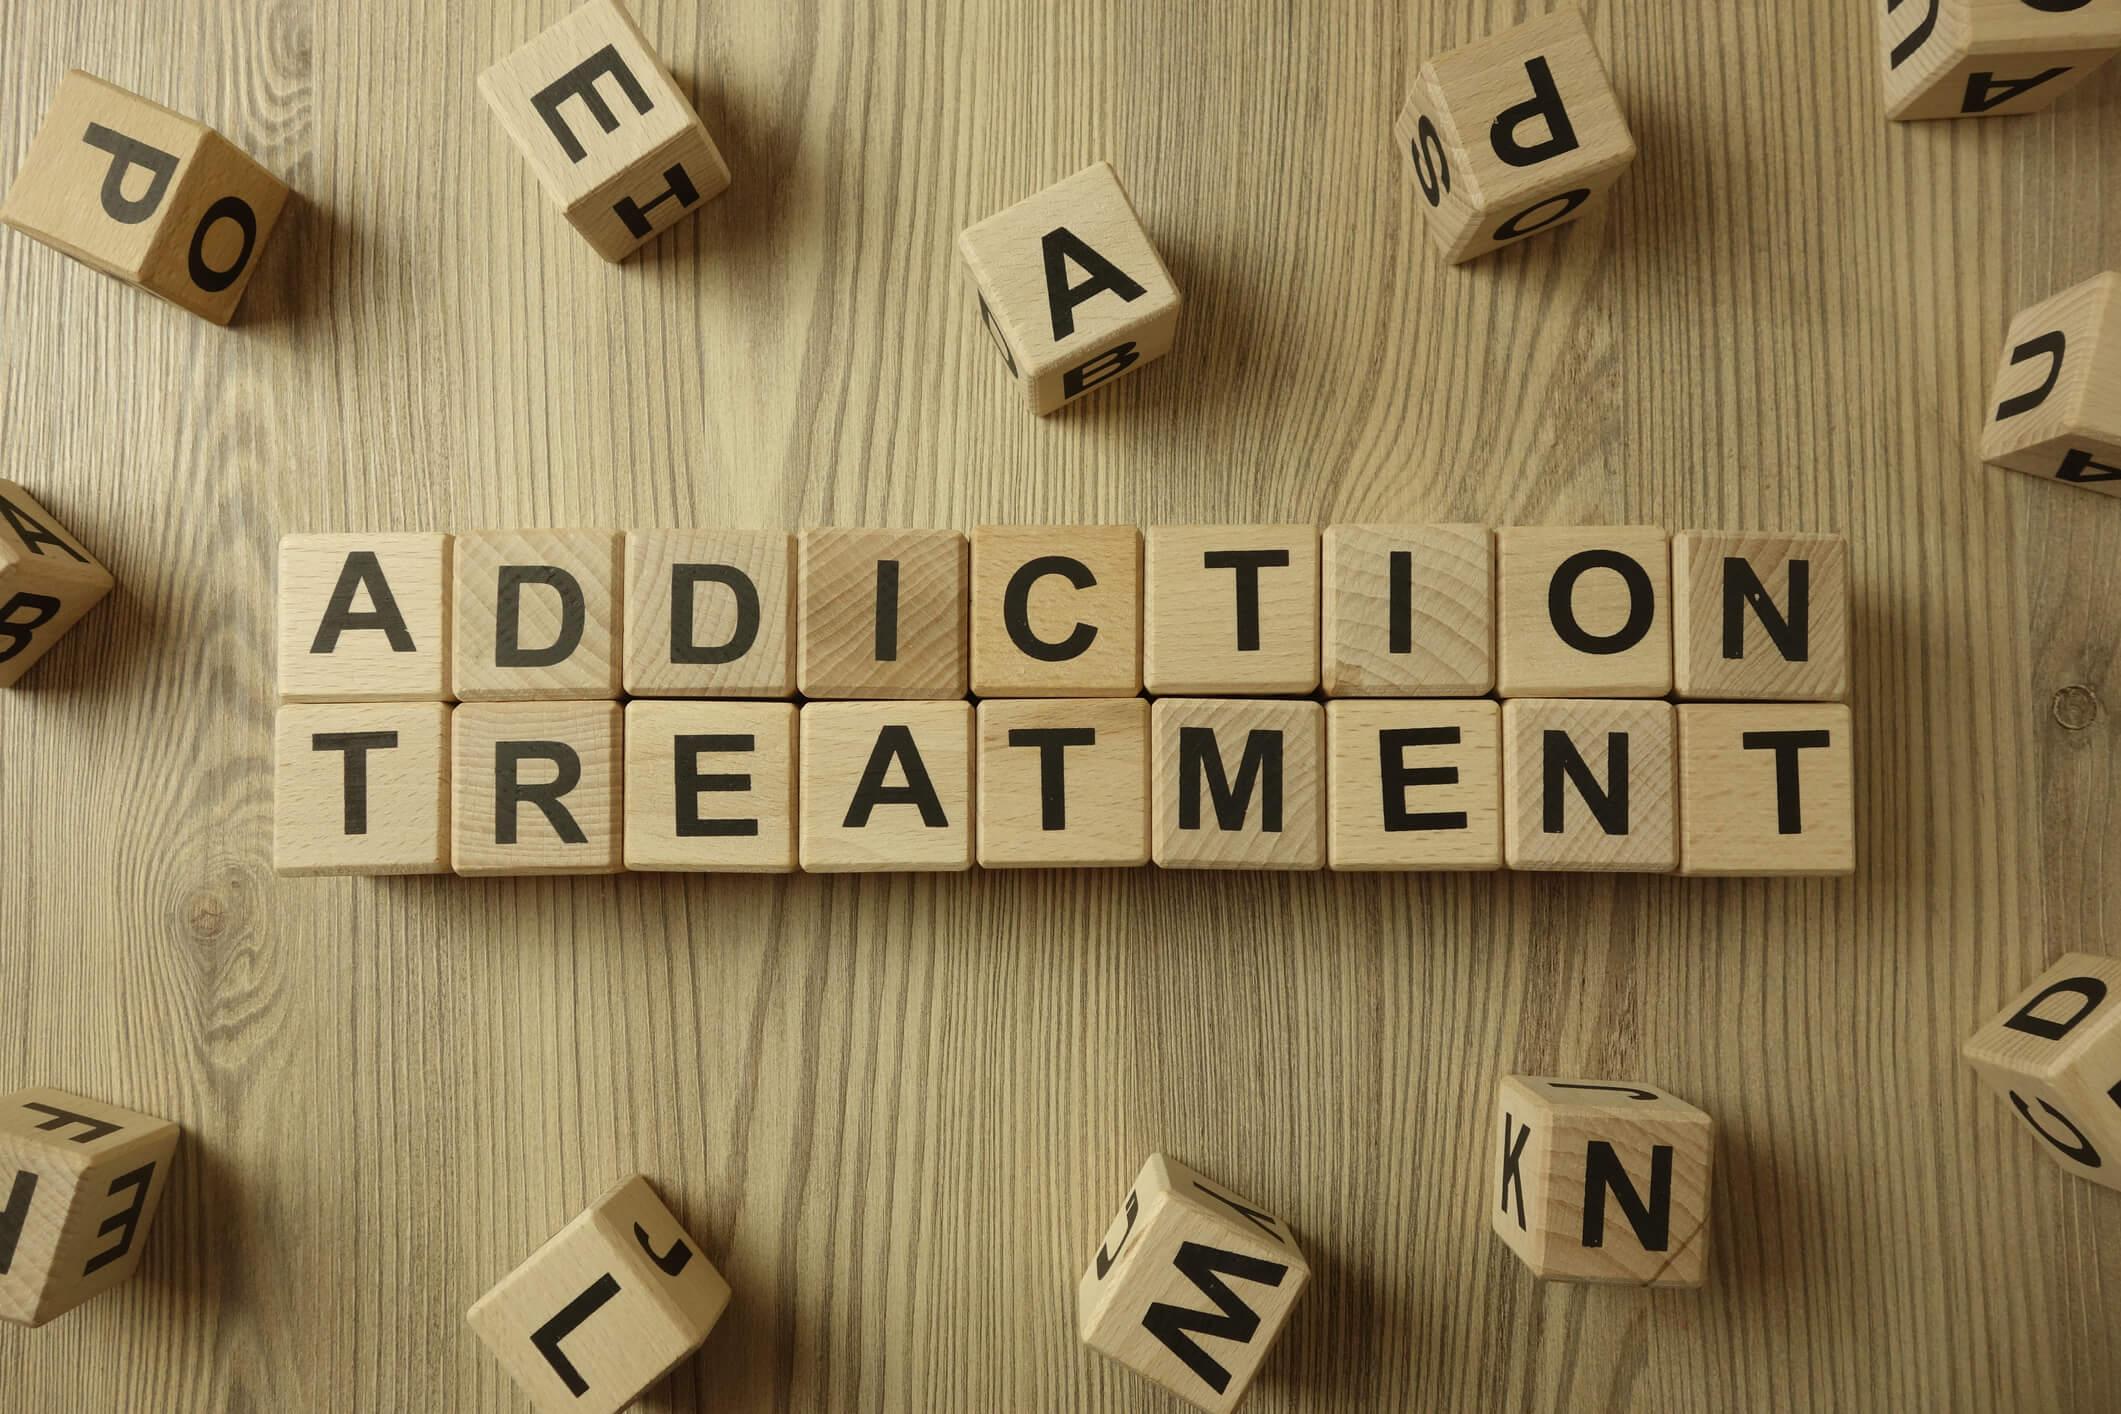 drug addiction treatment - Complete Controller